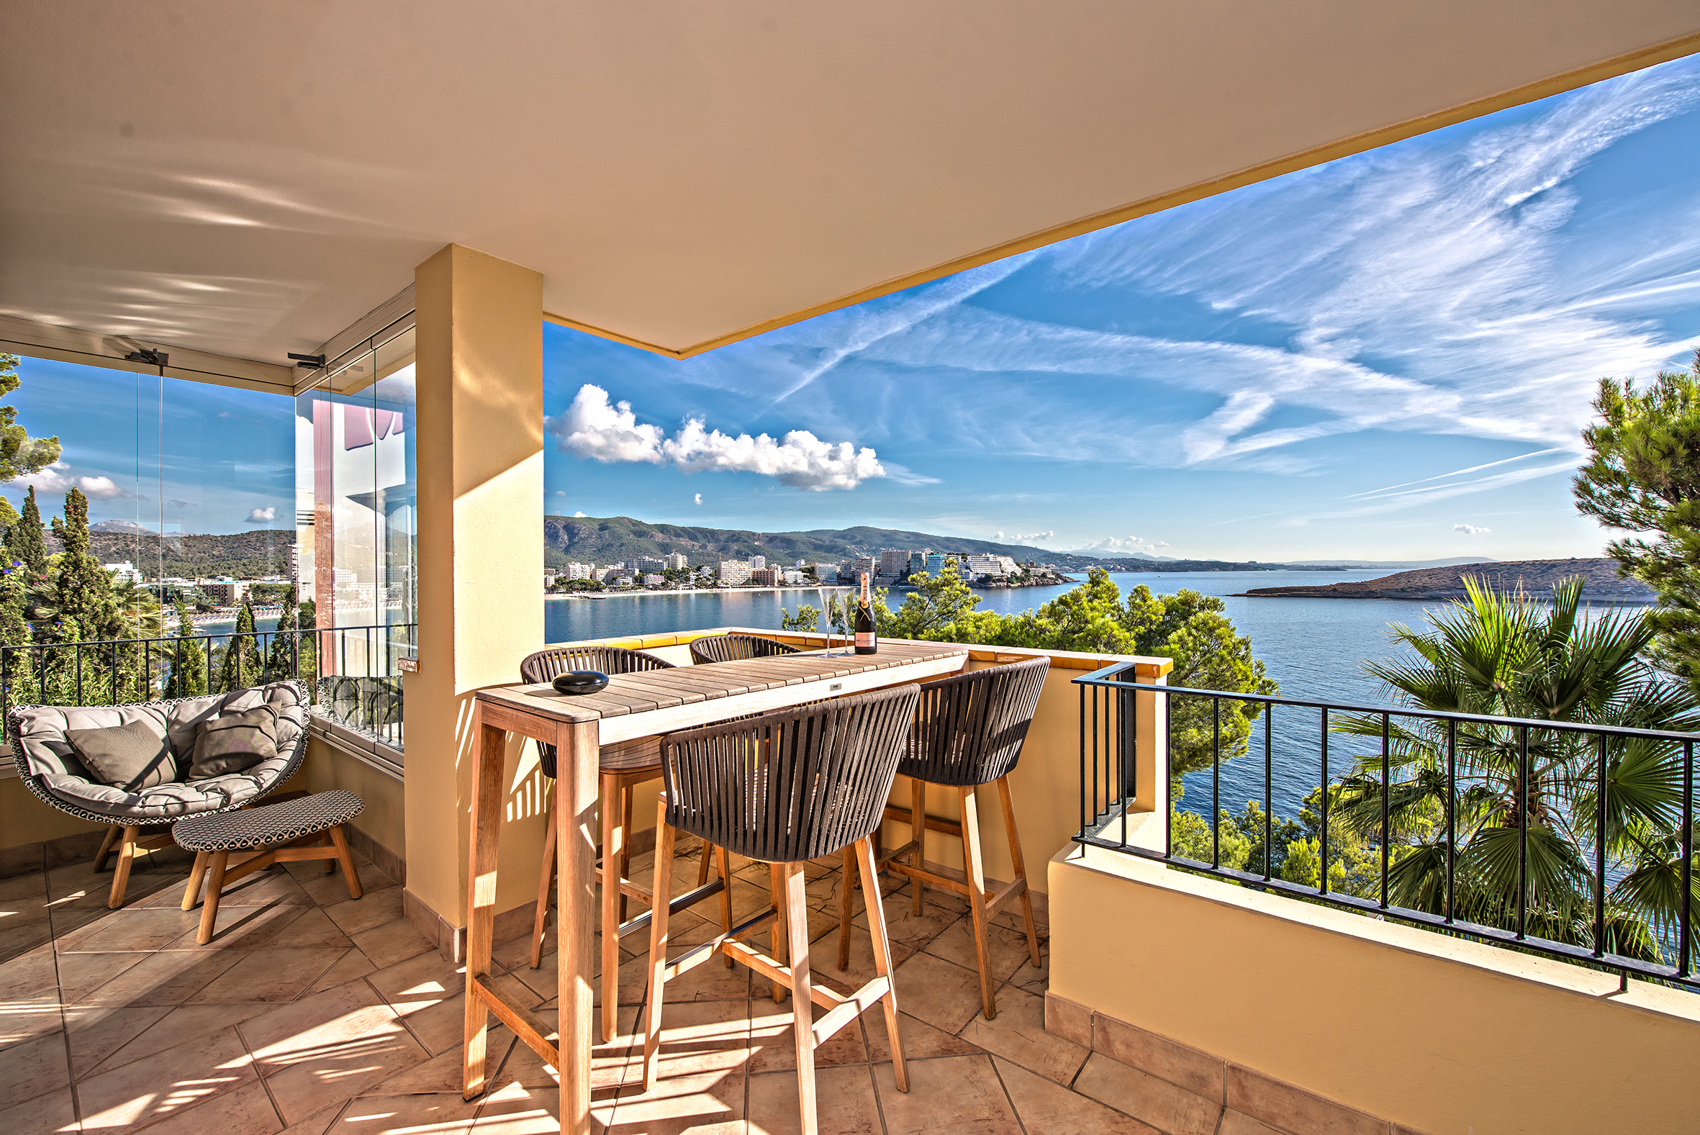 Wohnung-Meerblick-Investment-1.-Meereslinie-Mallorca